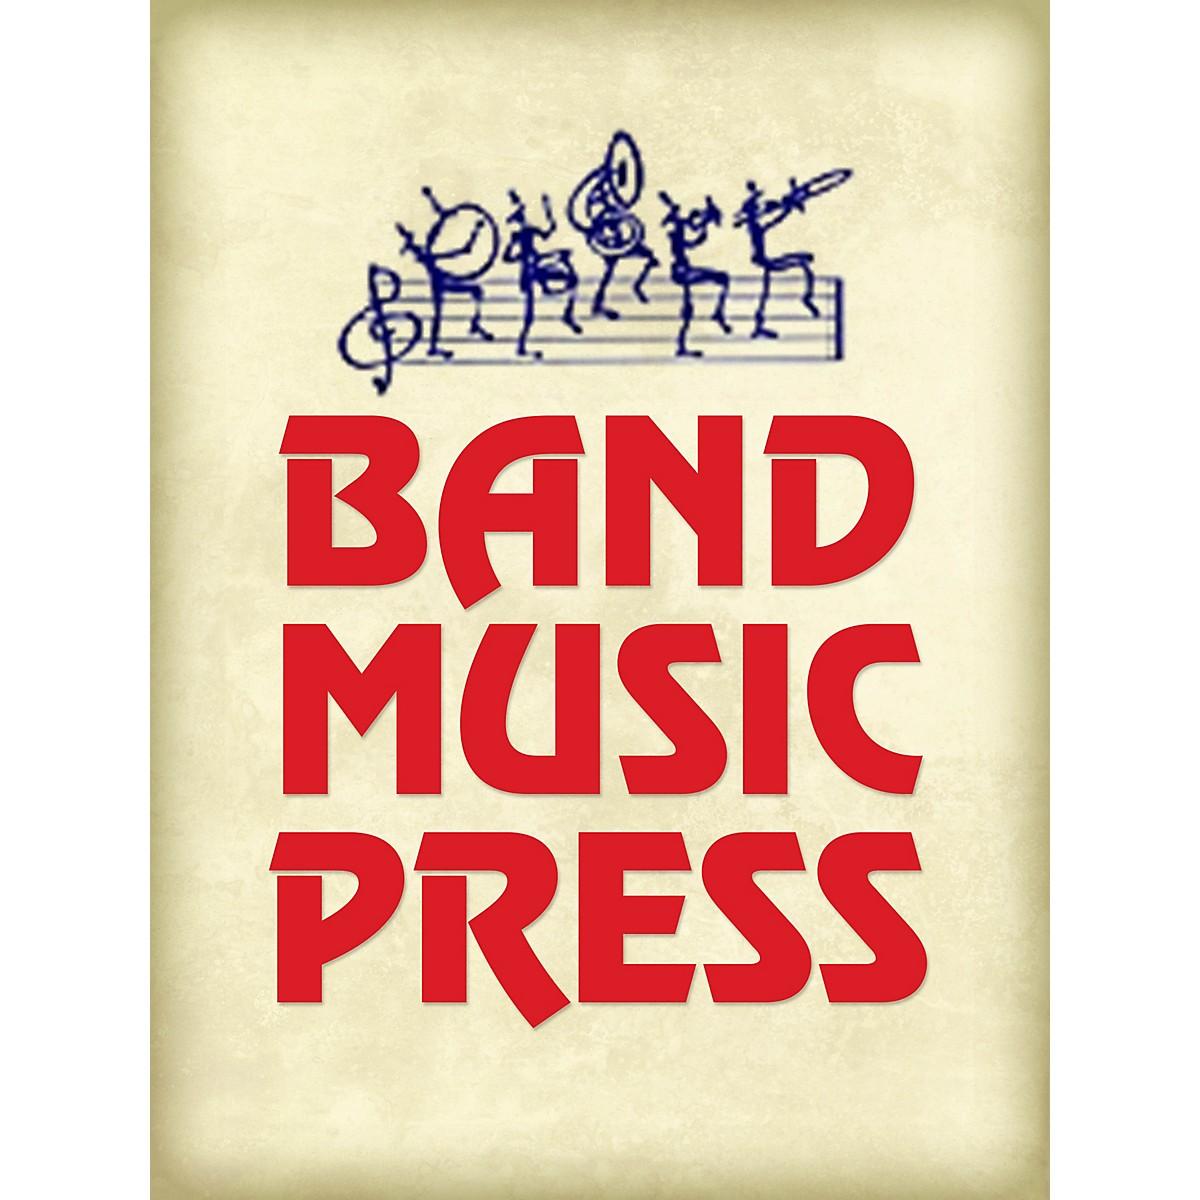 Band Music Press Funiculi, Funicula! Concert Band Level 2-2 1/2 Arranged by James Swearingen